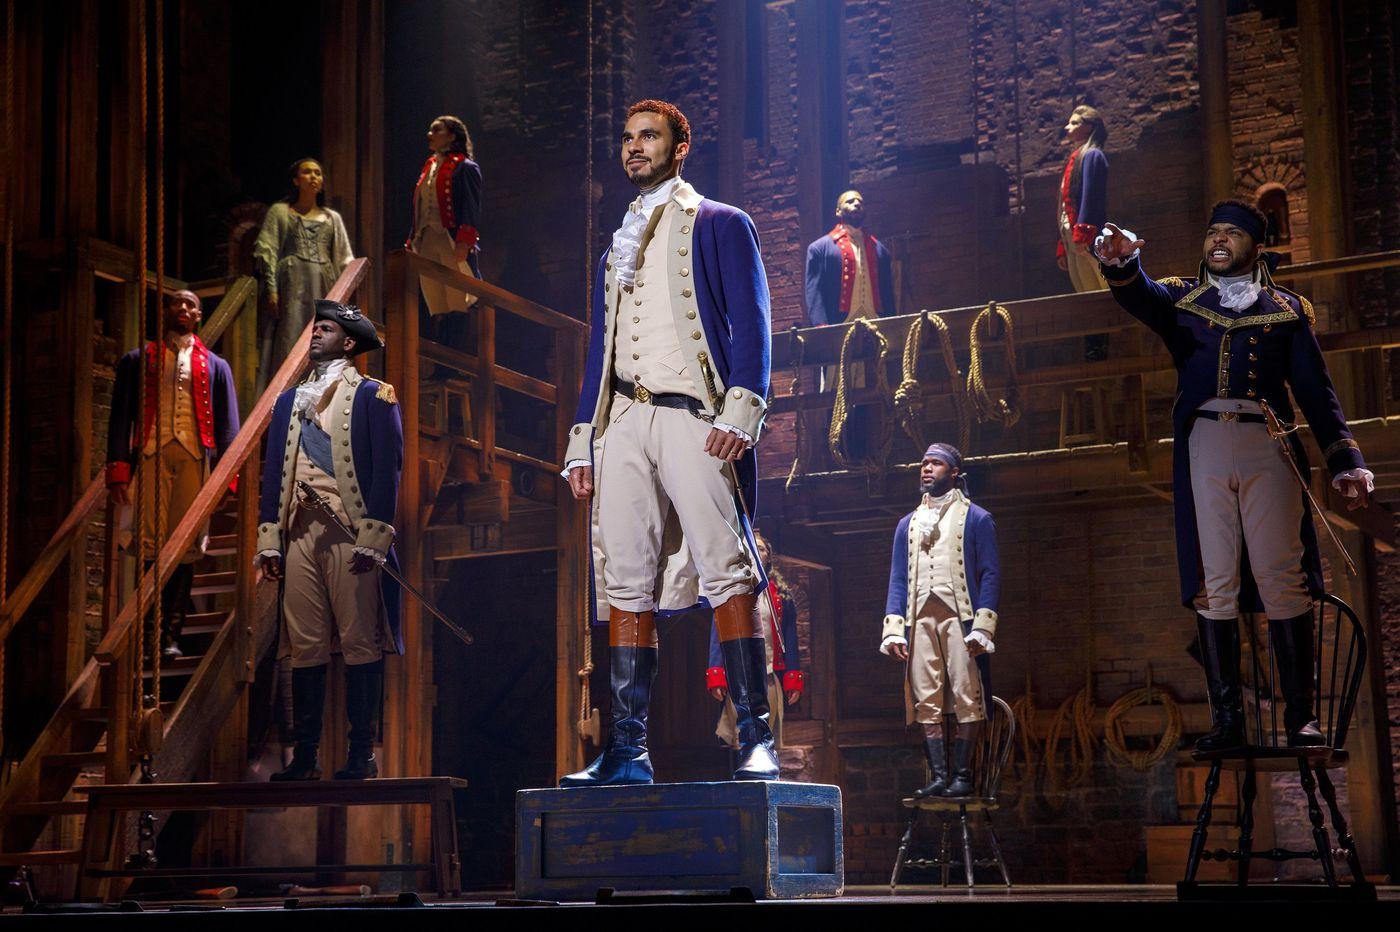 'Hamilton' at Forrest Theatre: Philadelphia, it was worth the wait